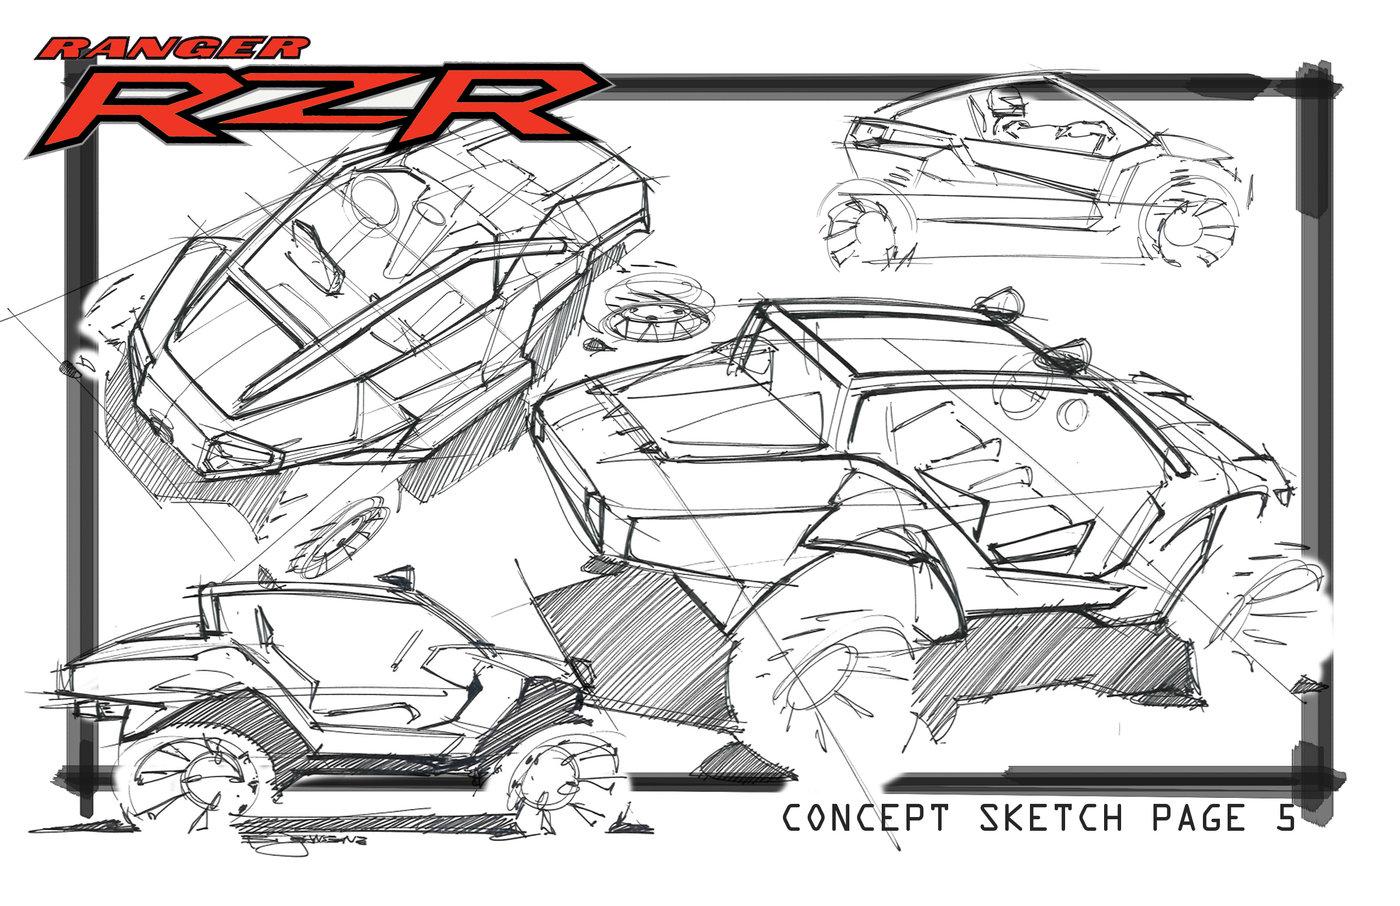 RZR sketches by Bryan Johnson at Coroflot.com